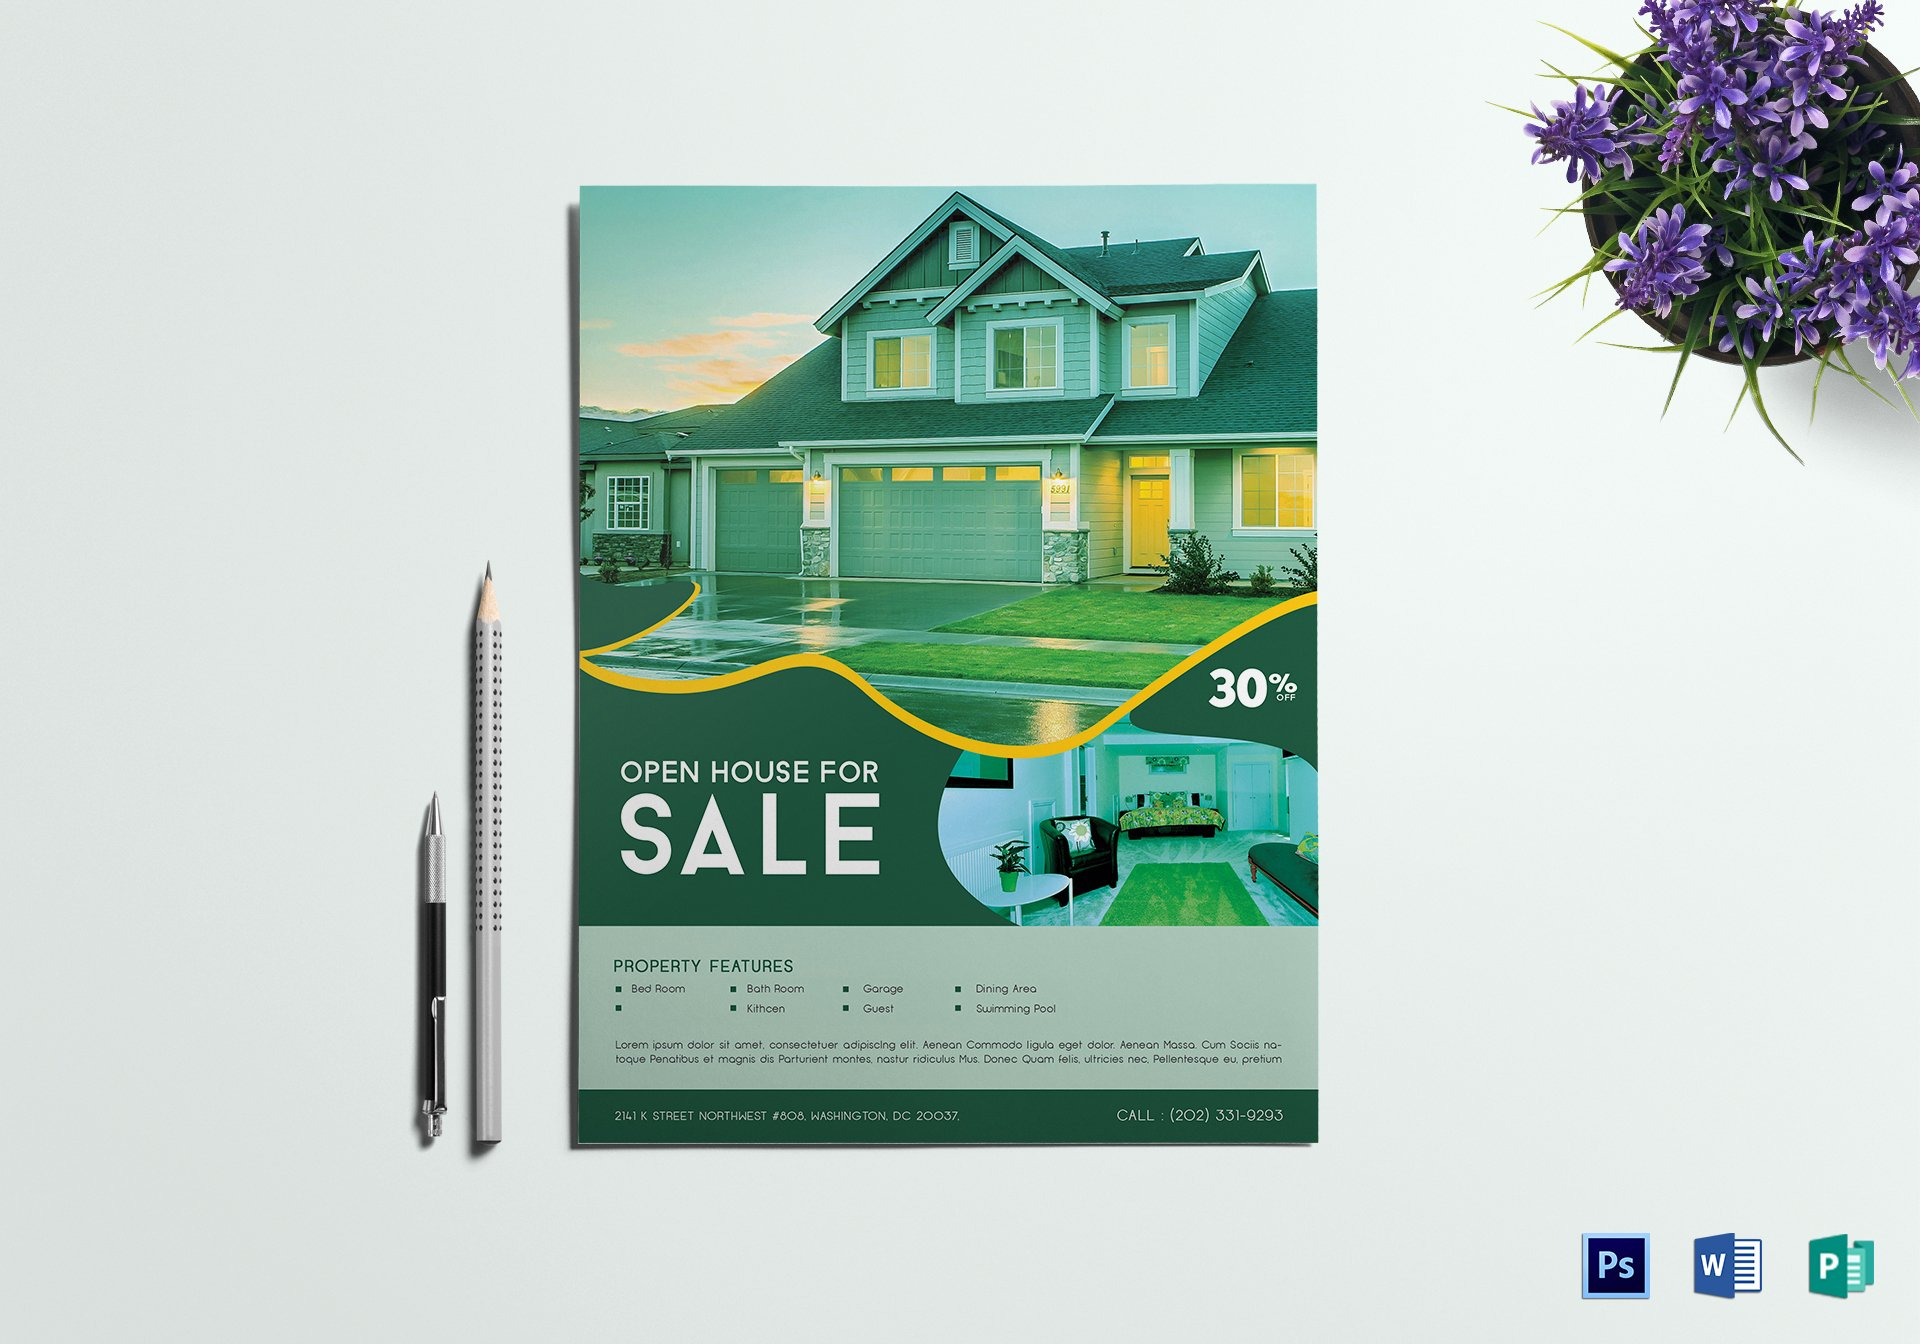 Open House Flyer Template Publisher Elegant Open House Sale Flyer Design Template In Word Psd Publisher